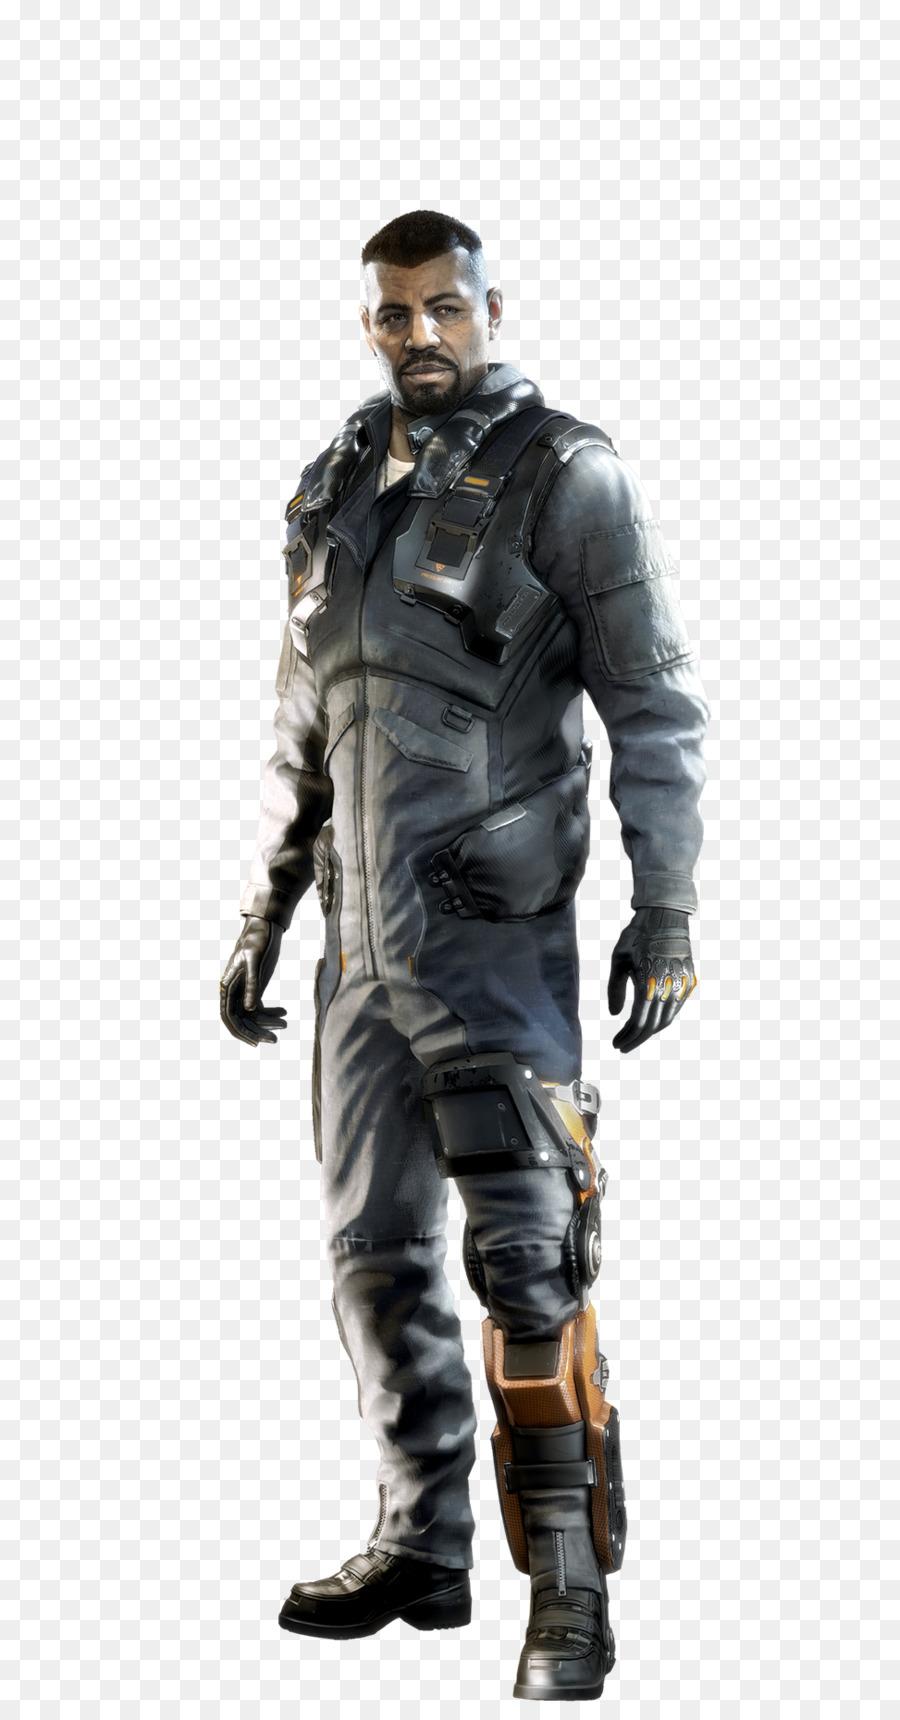 Deus Ex: Human Revolution Deus Ex: Mankind Divided Video game Soldier - Deus  Ex - Deus Ex PNG